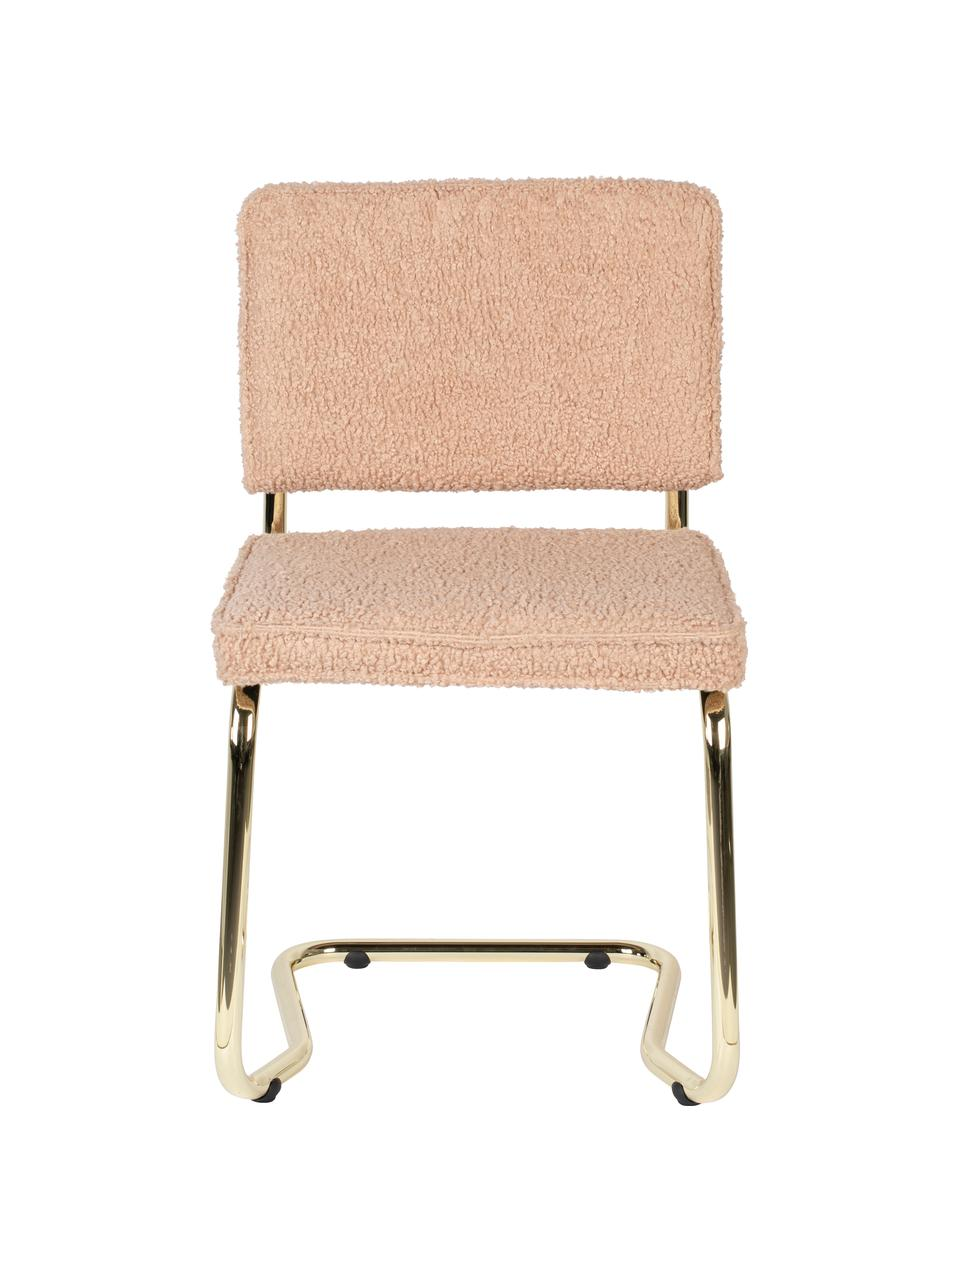 Teddy cantilever stoel Kink in roze, Bekleding: teddystof (100% polyester, Frame: gecoat metaal, Poten: kunststof, Roze, messingkleurig, 48 x 48 cm